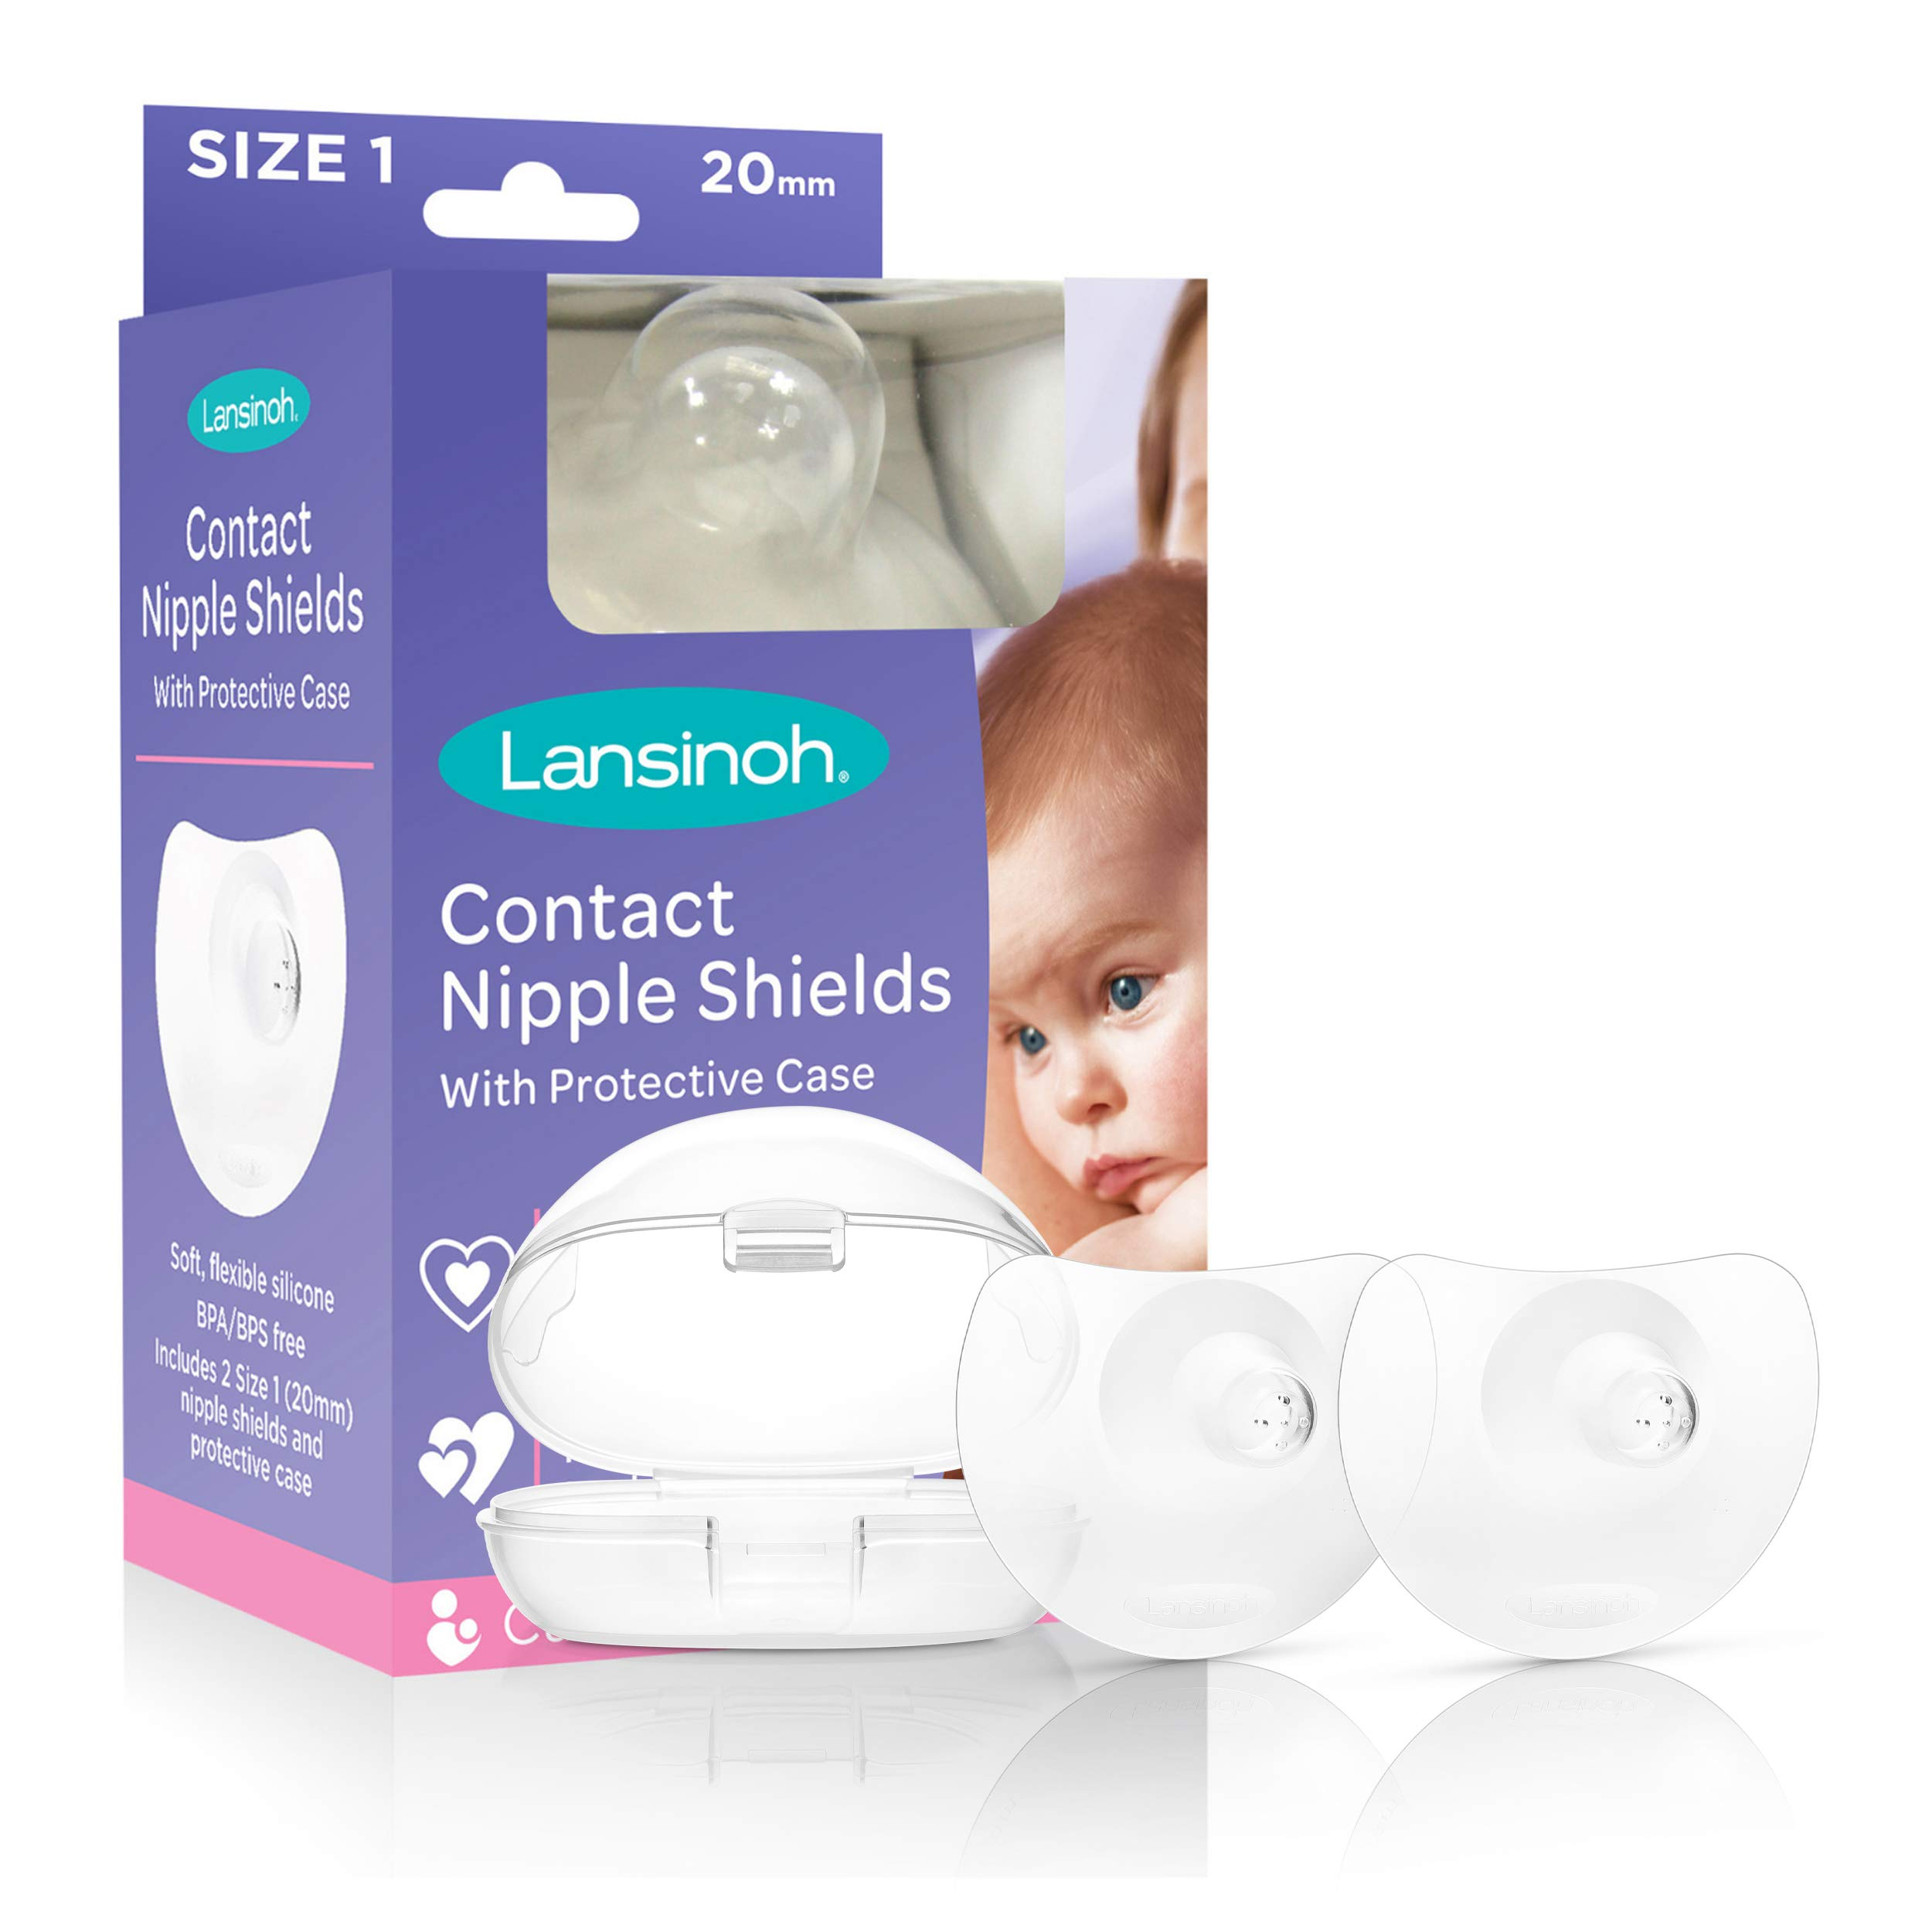 Lansinoh Contact Nipple Shields